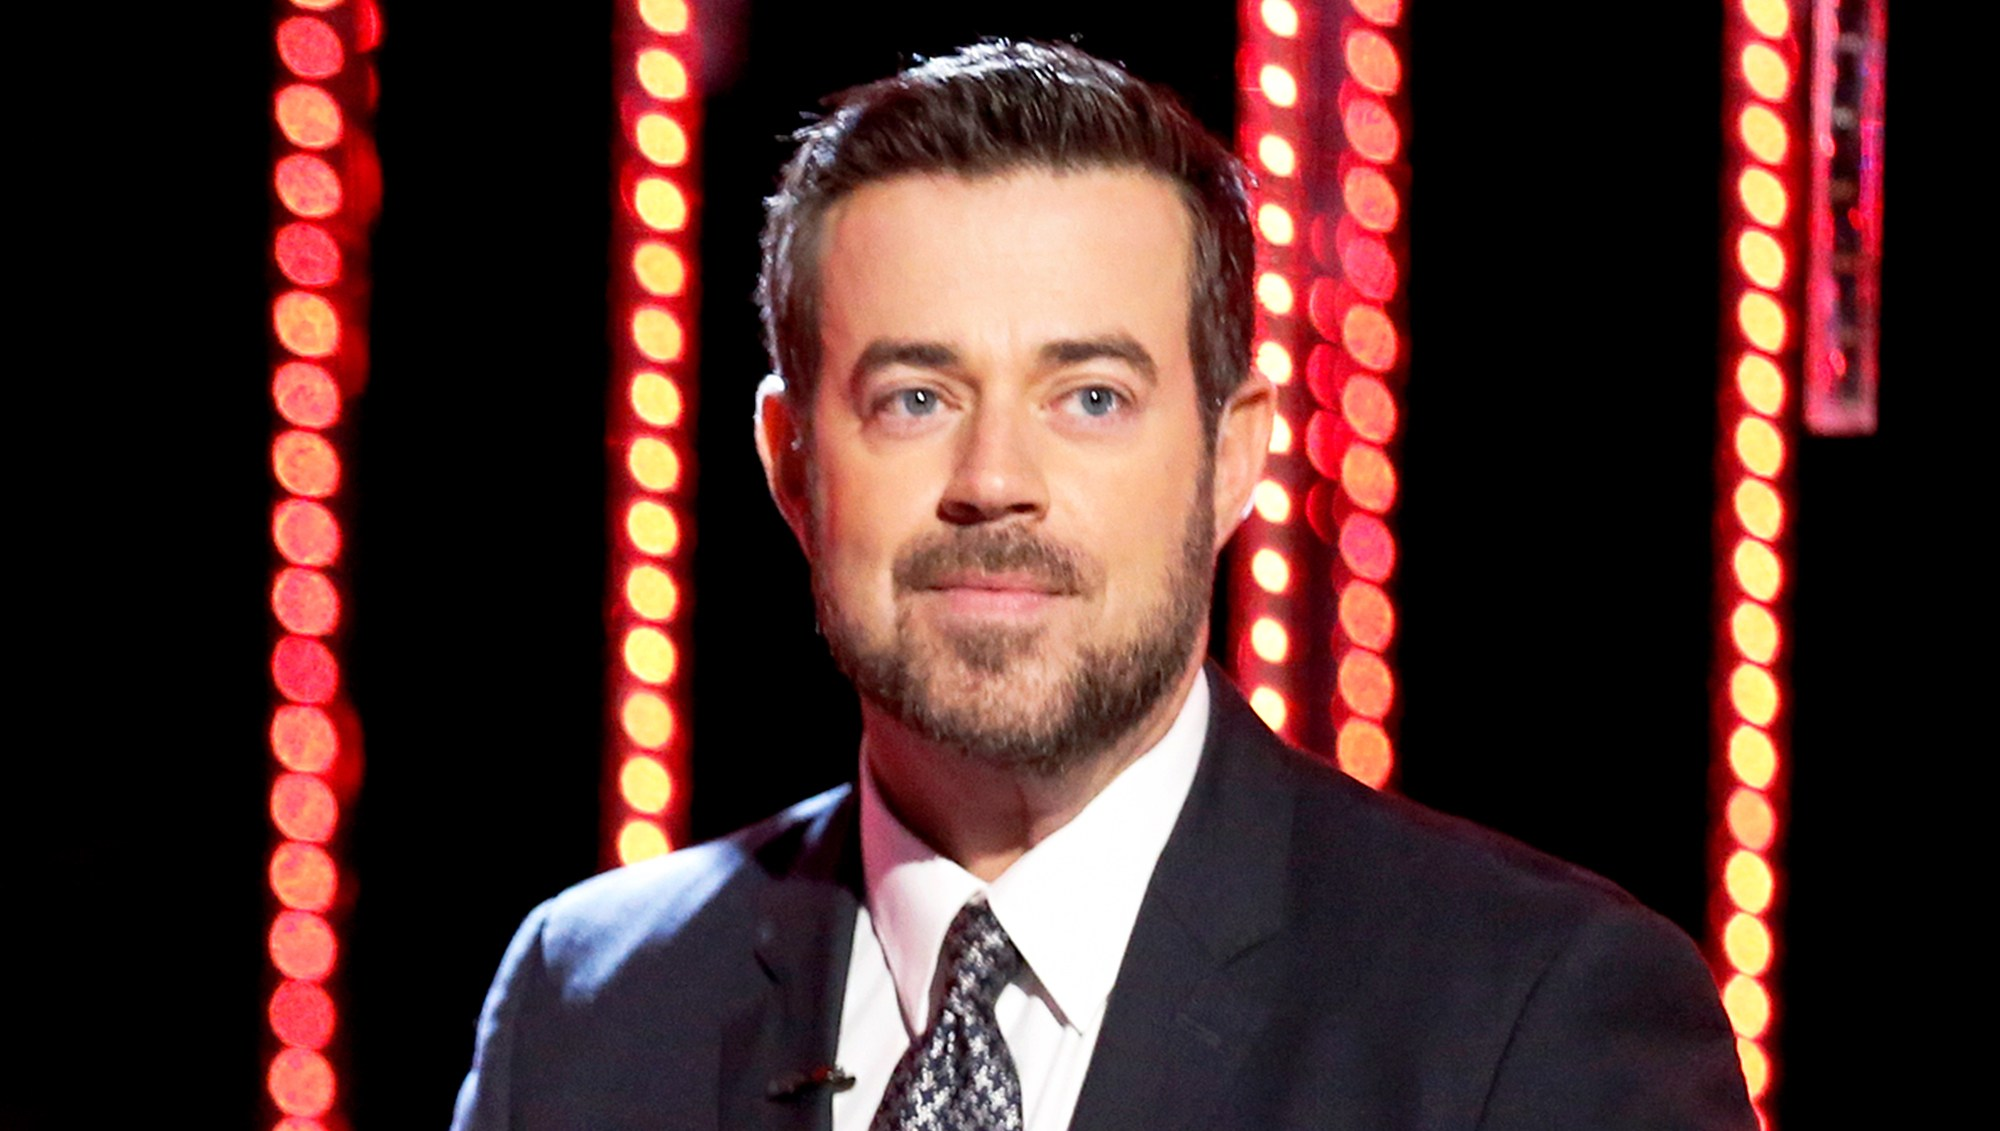 Carson Daly The Voice Season 11